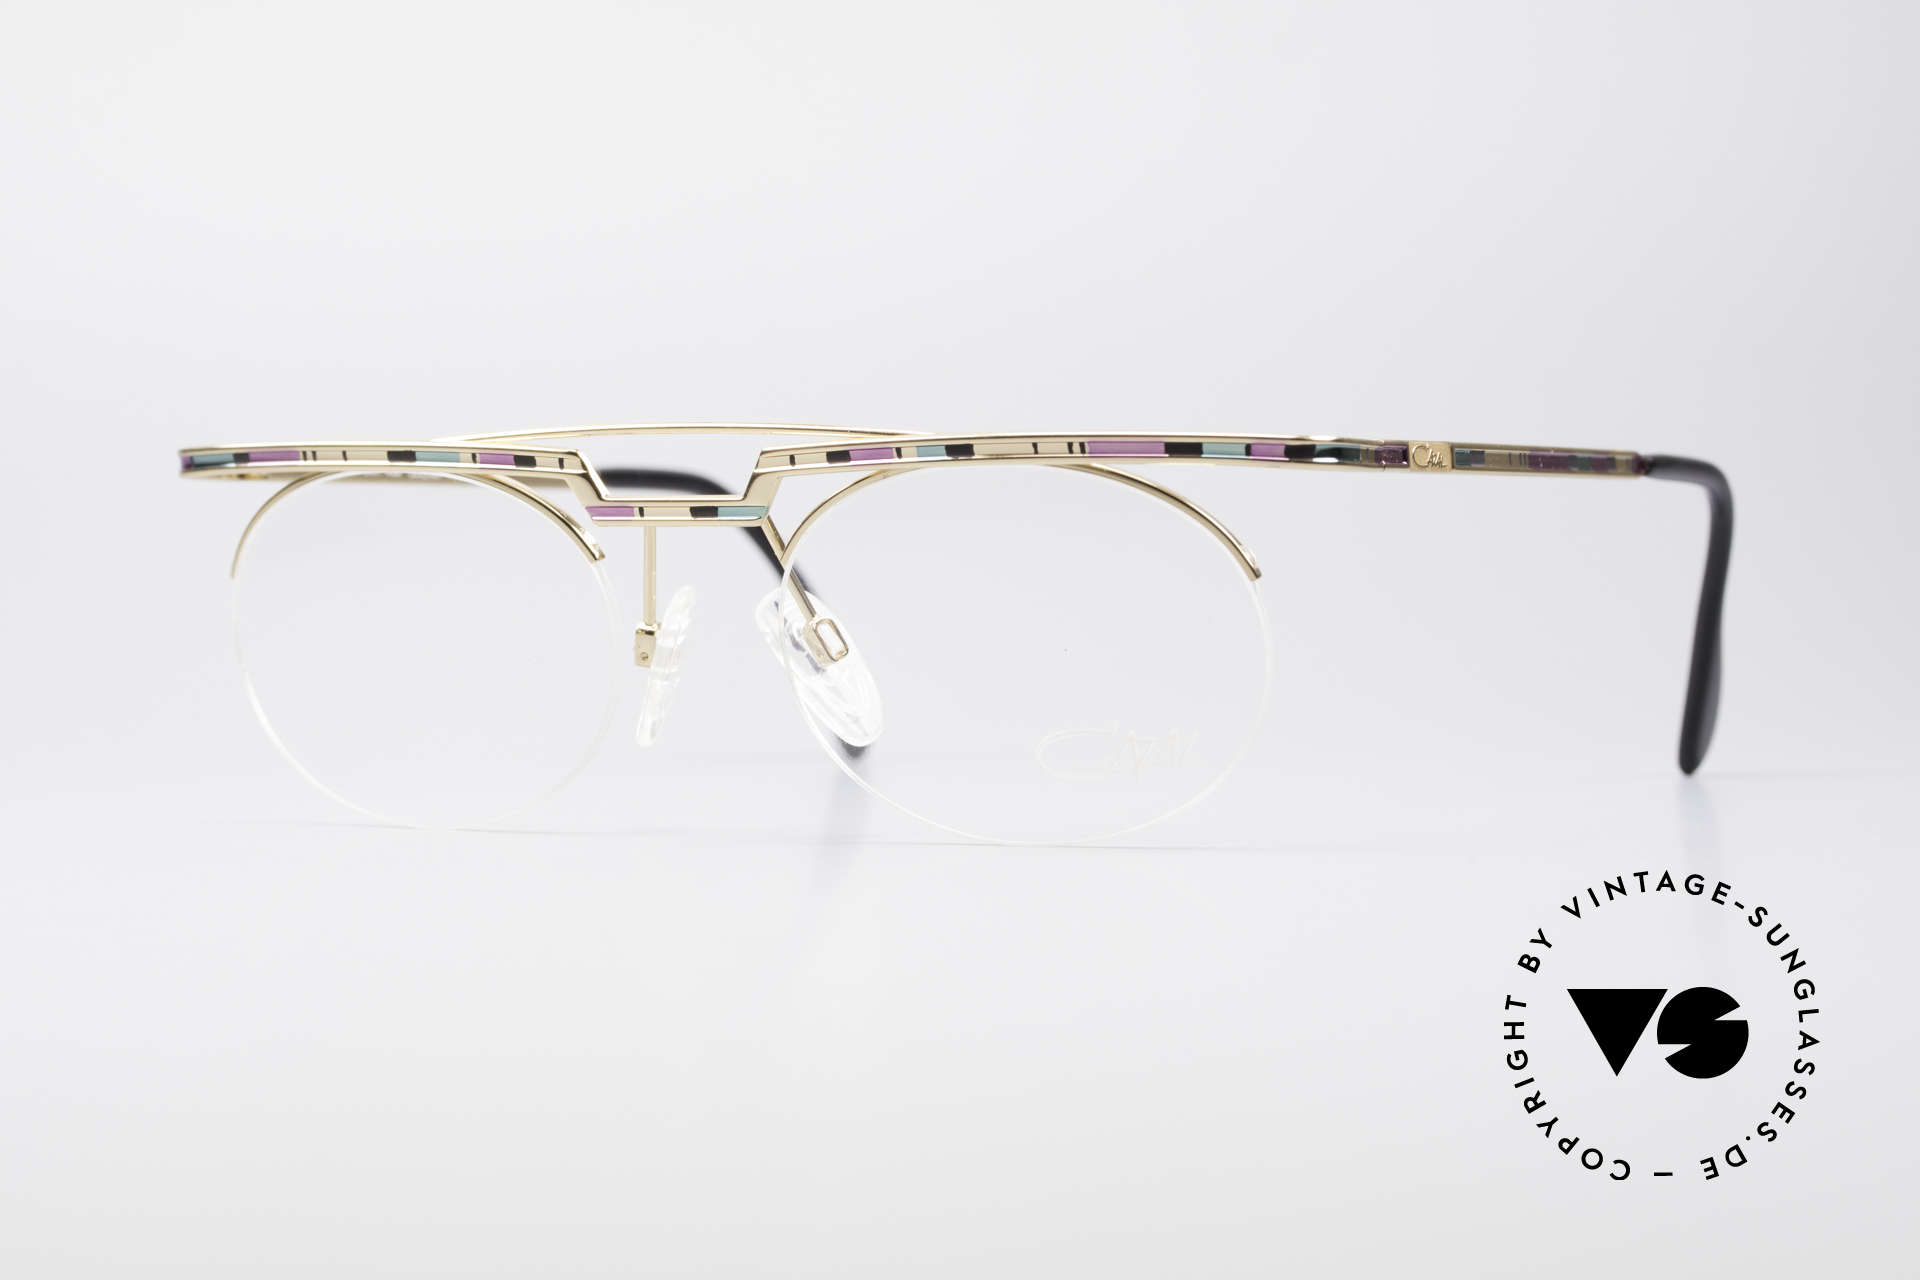 Cazal 758 Original Glasses No Retro Frame, interesting Cazal vintage eyeglasses-frame from 1997/98, Made for Men and Women